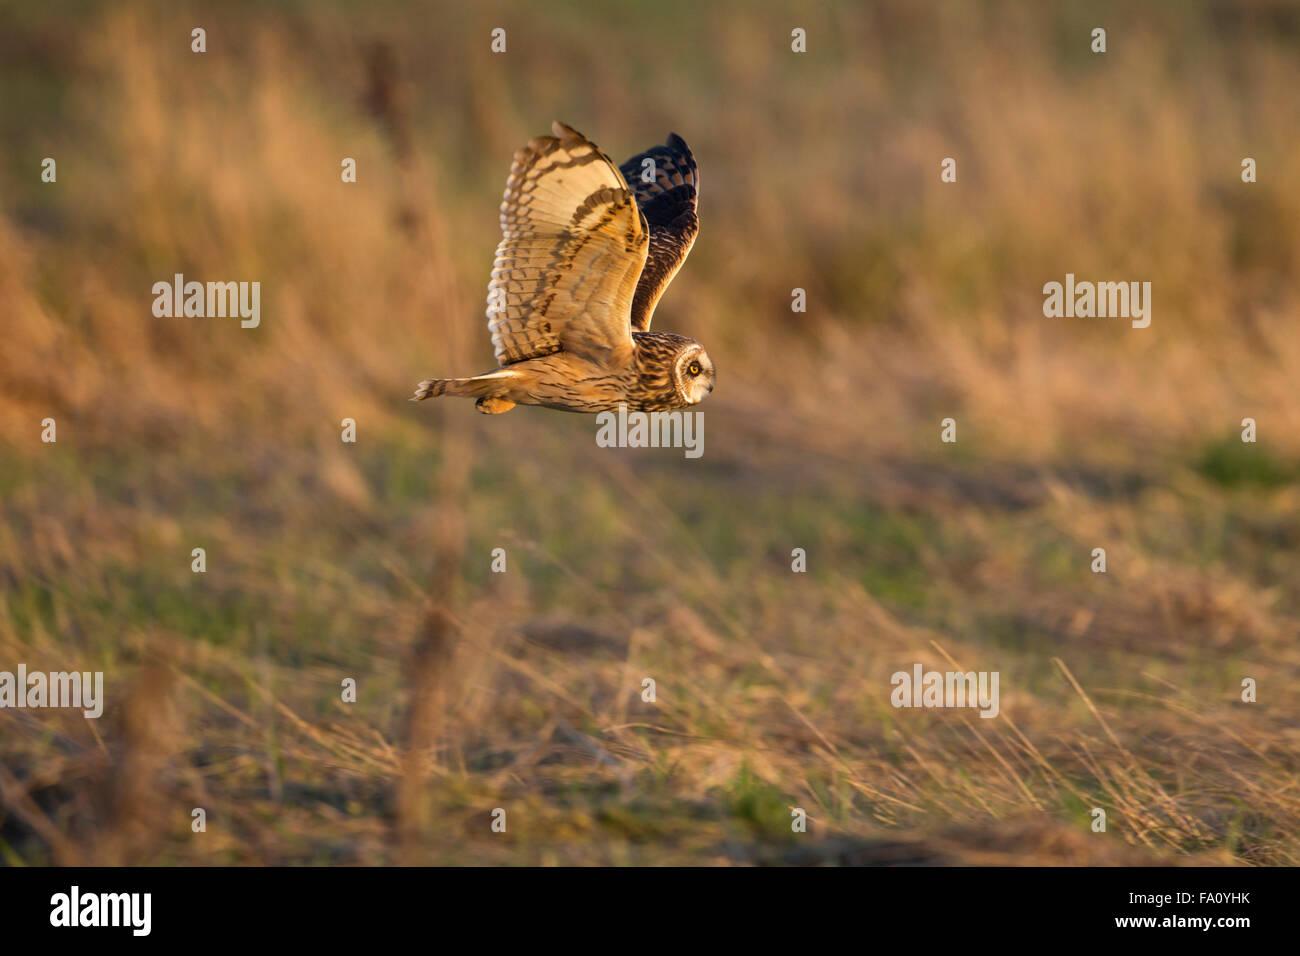 Short-eared Owl, Asio flammeus, - Stock Image